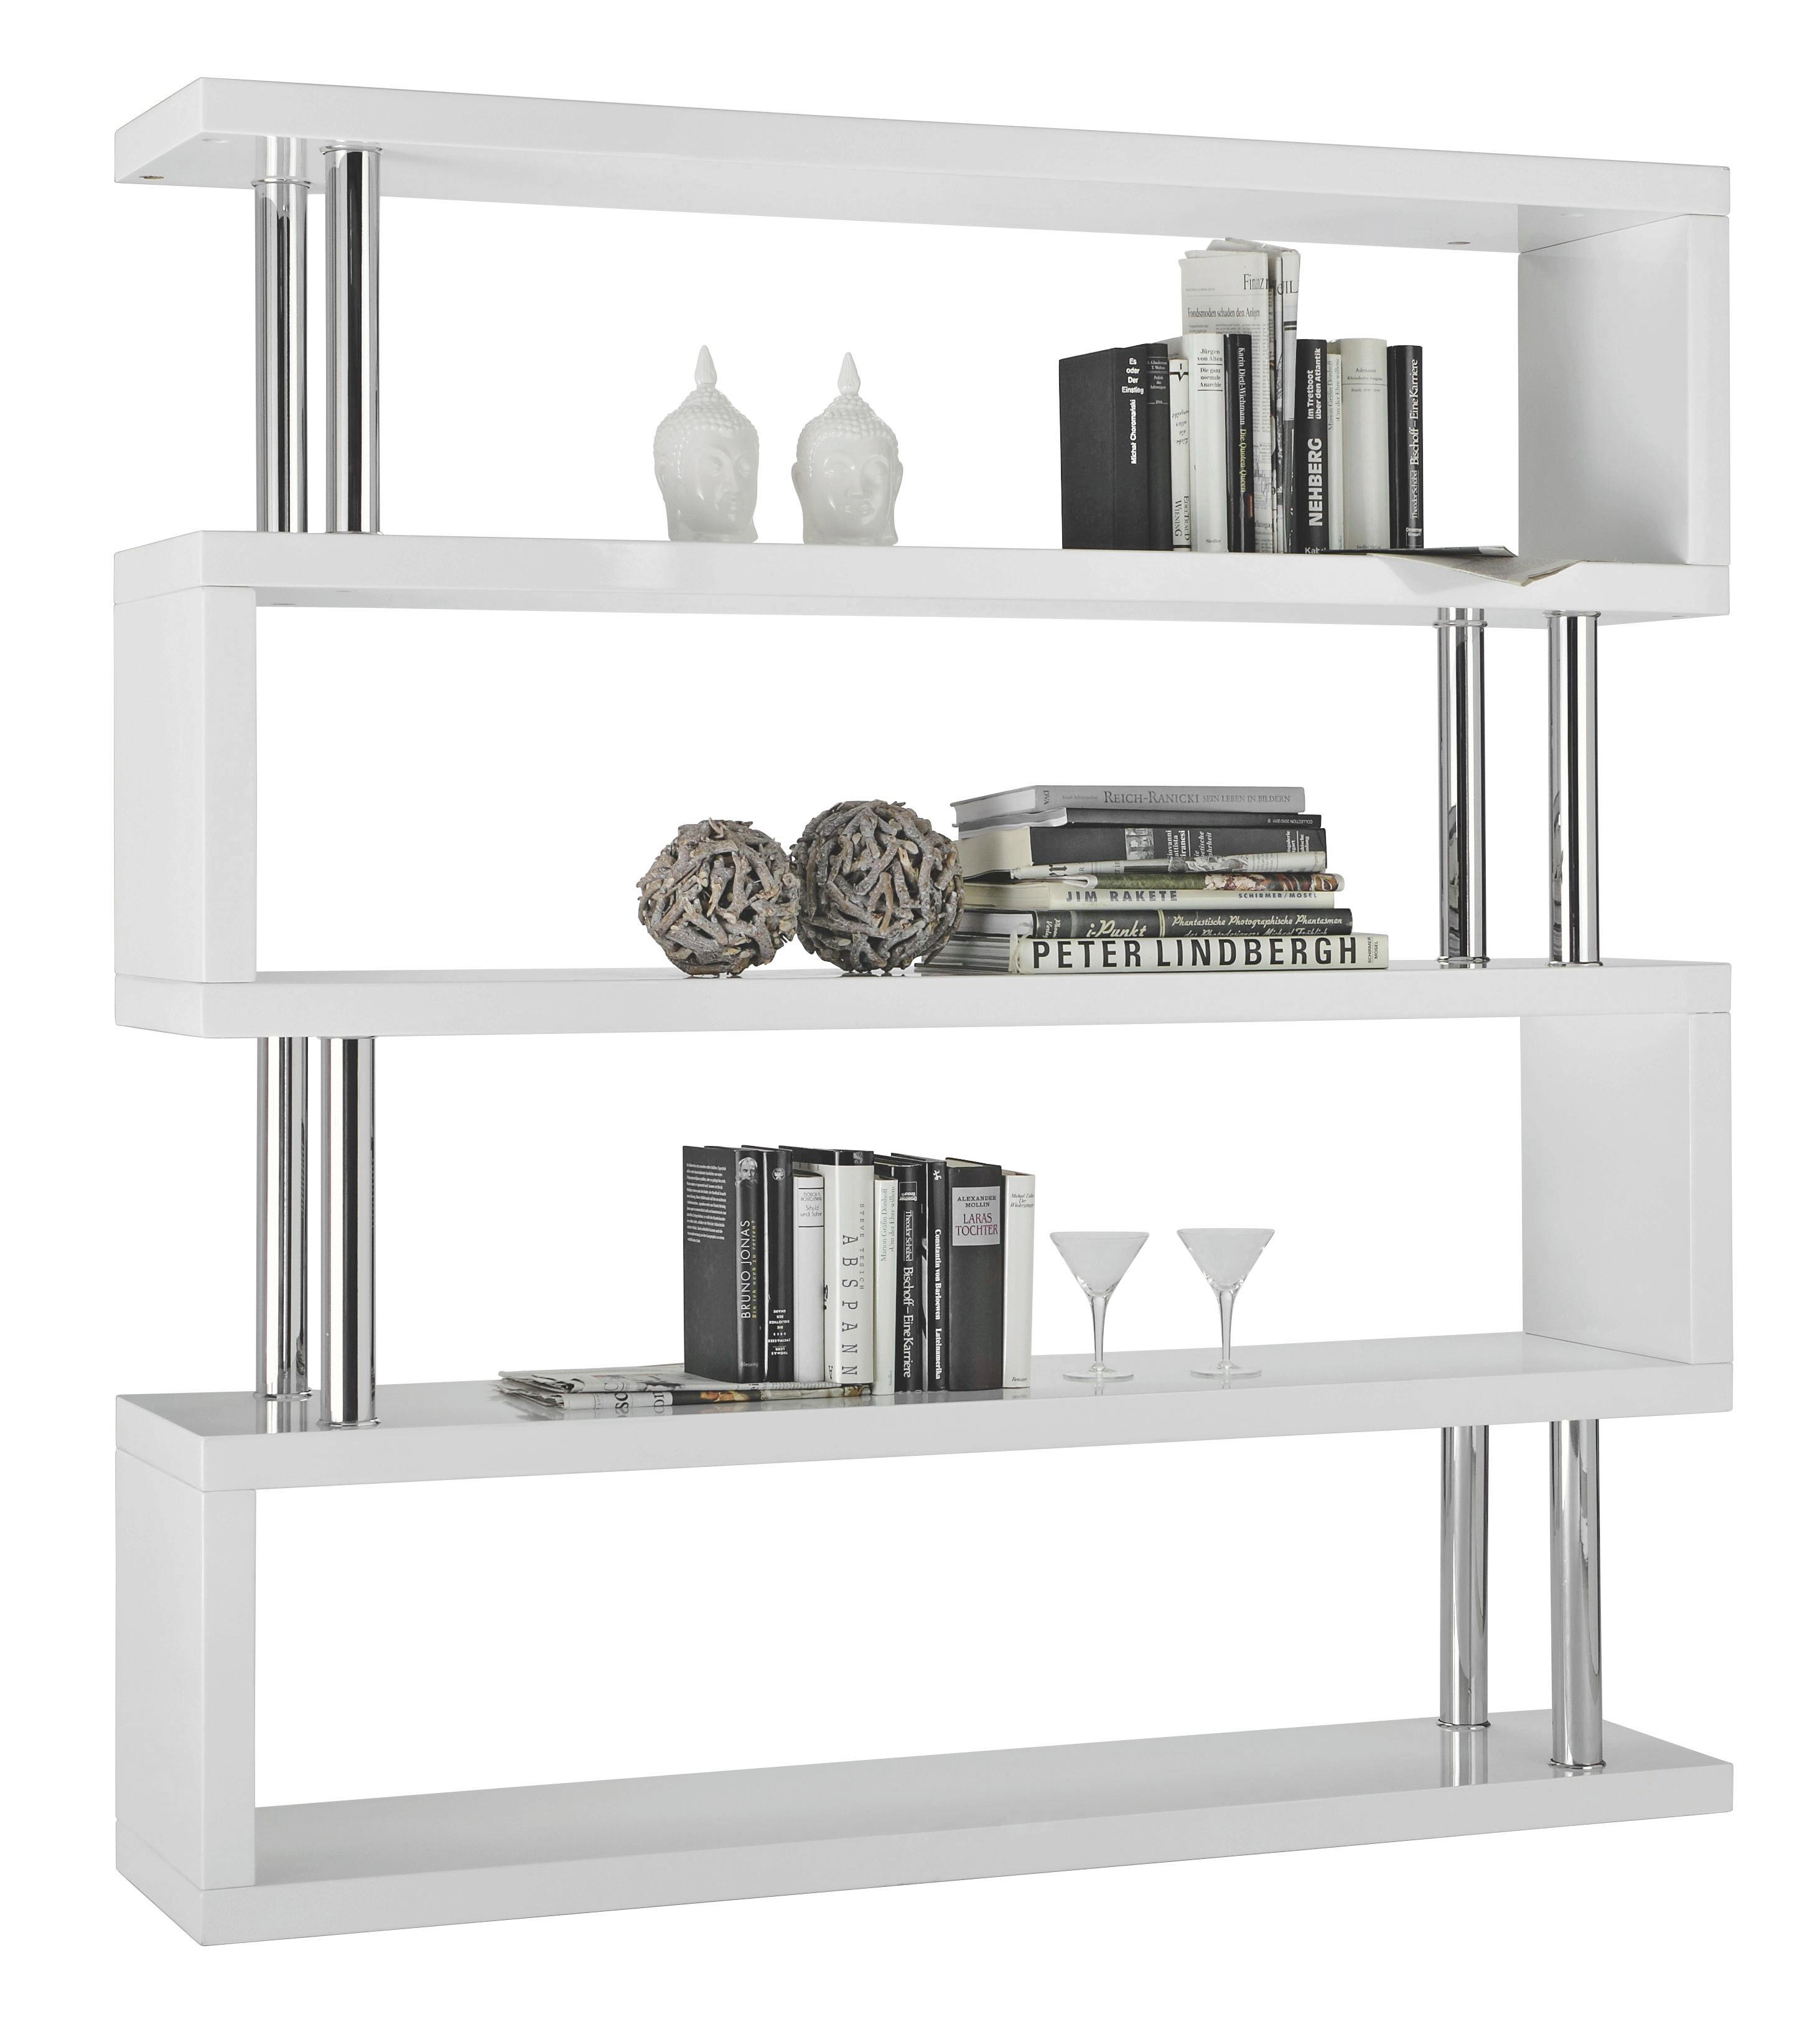 REGÁL - bílá/barvy chromu, Design, kov/dřevěný materiál (156/165/35cm) - CARRYHOME